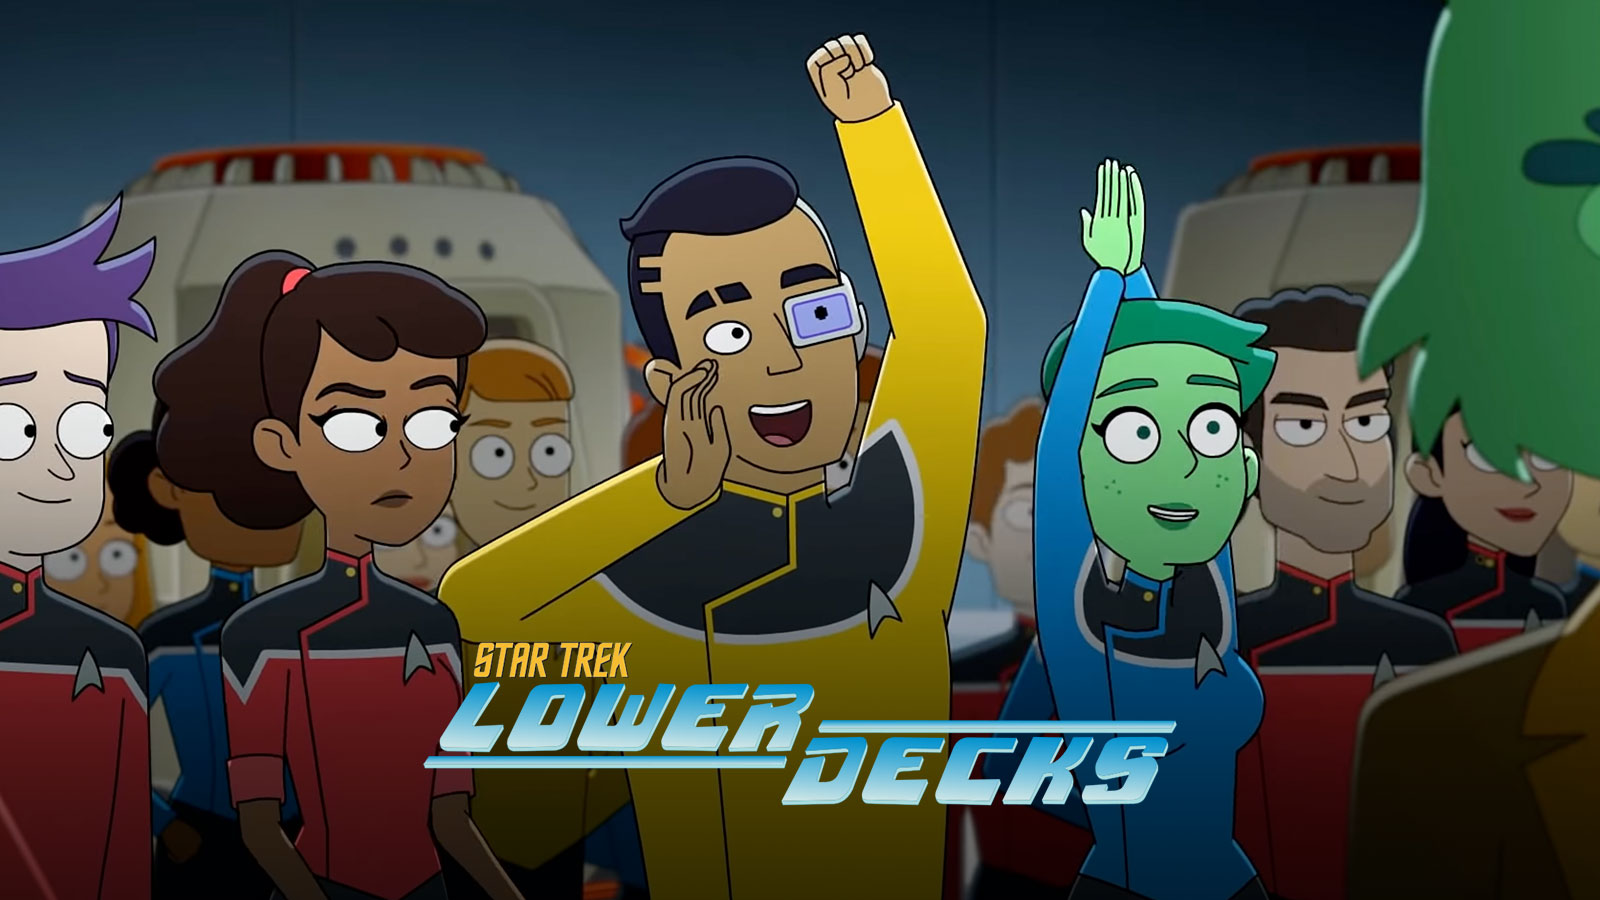 Star Trek: Lower Decks Season 2 Will Be Available On Amazon Prime Internationally